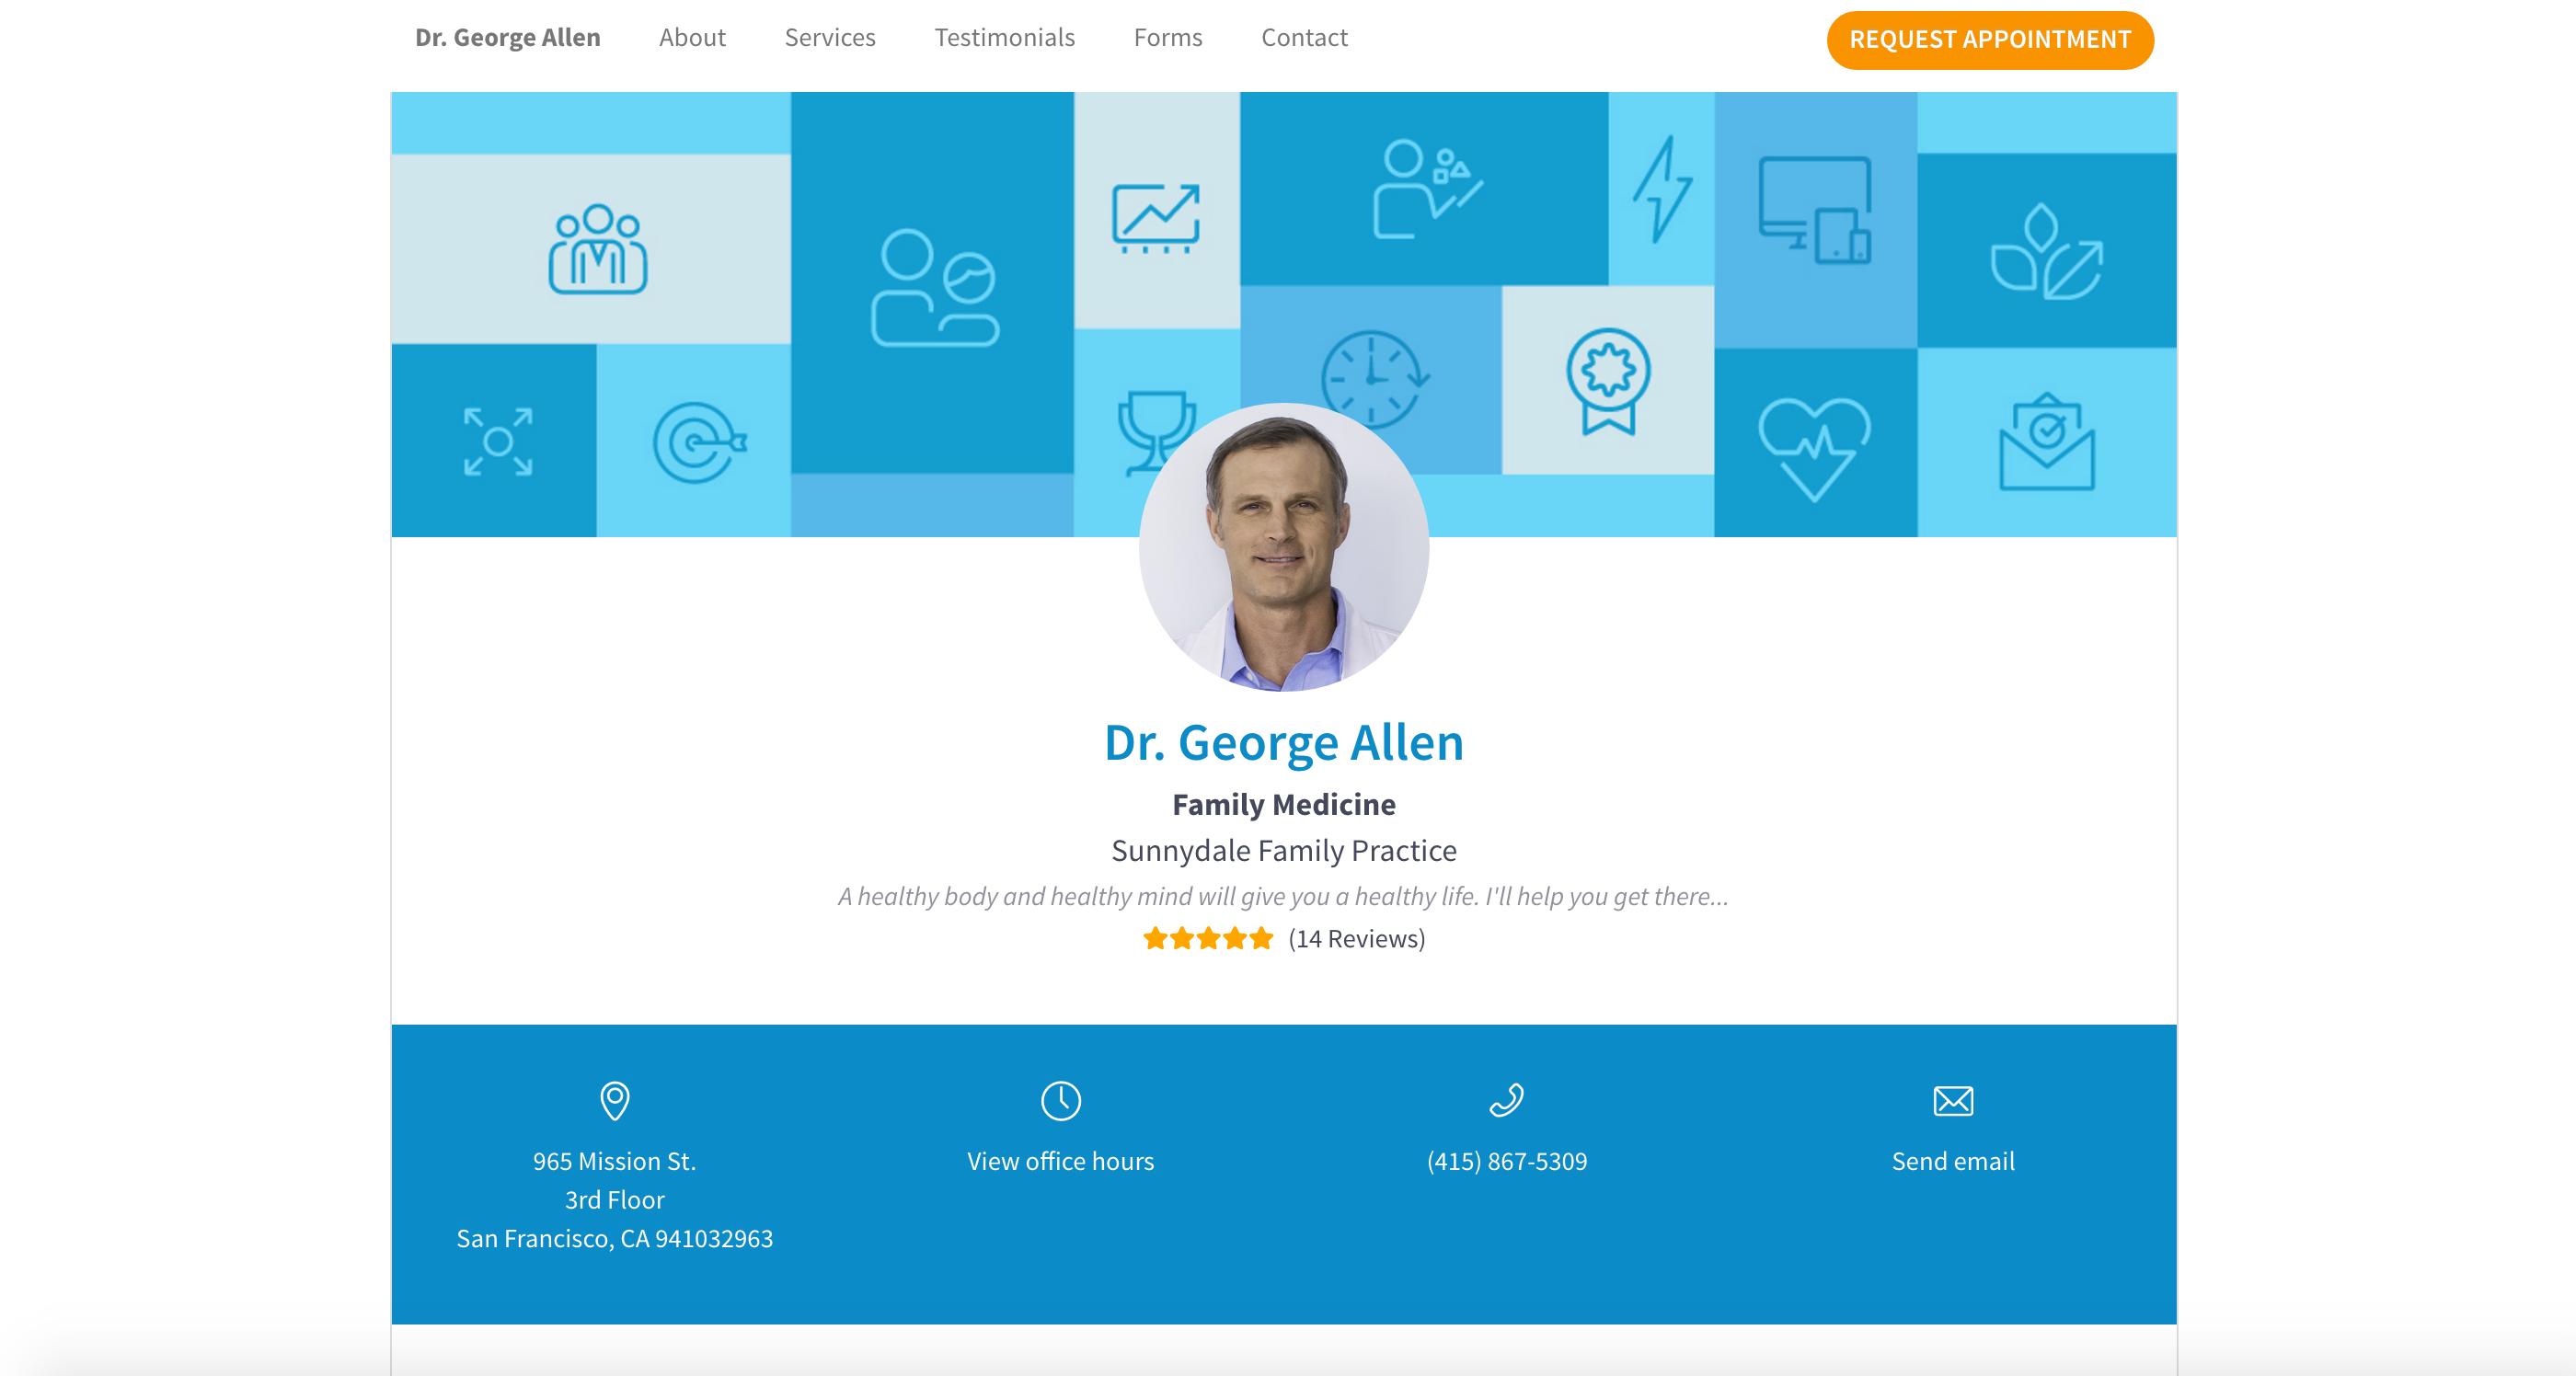 Screenshot of physician details